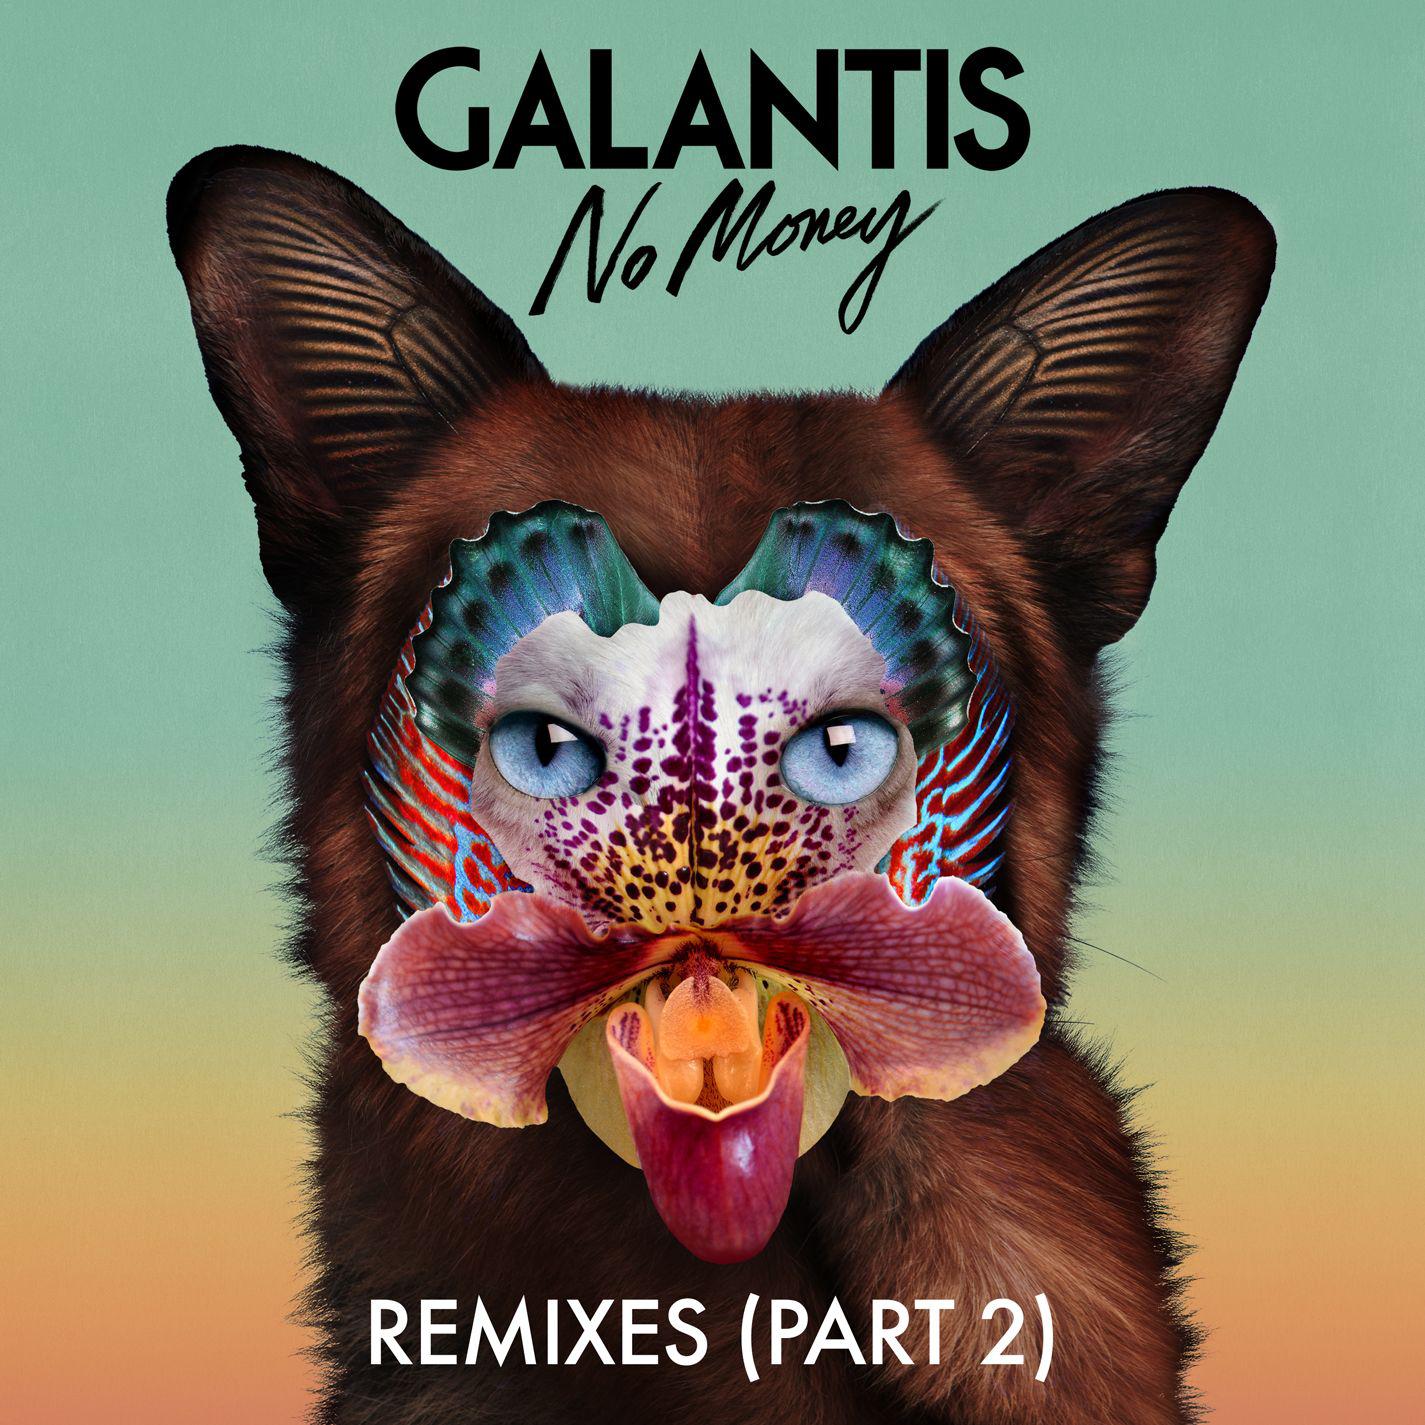 Galantis - No Money (Remixes, Pt. 2) - EP Cover